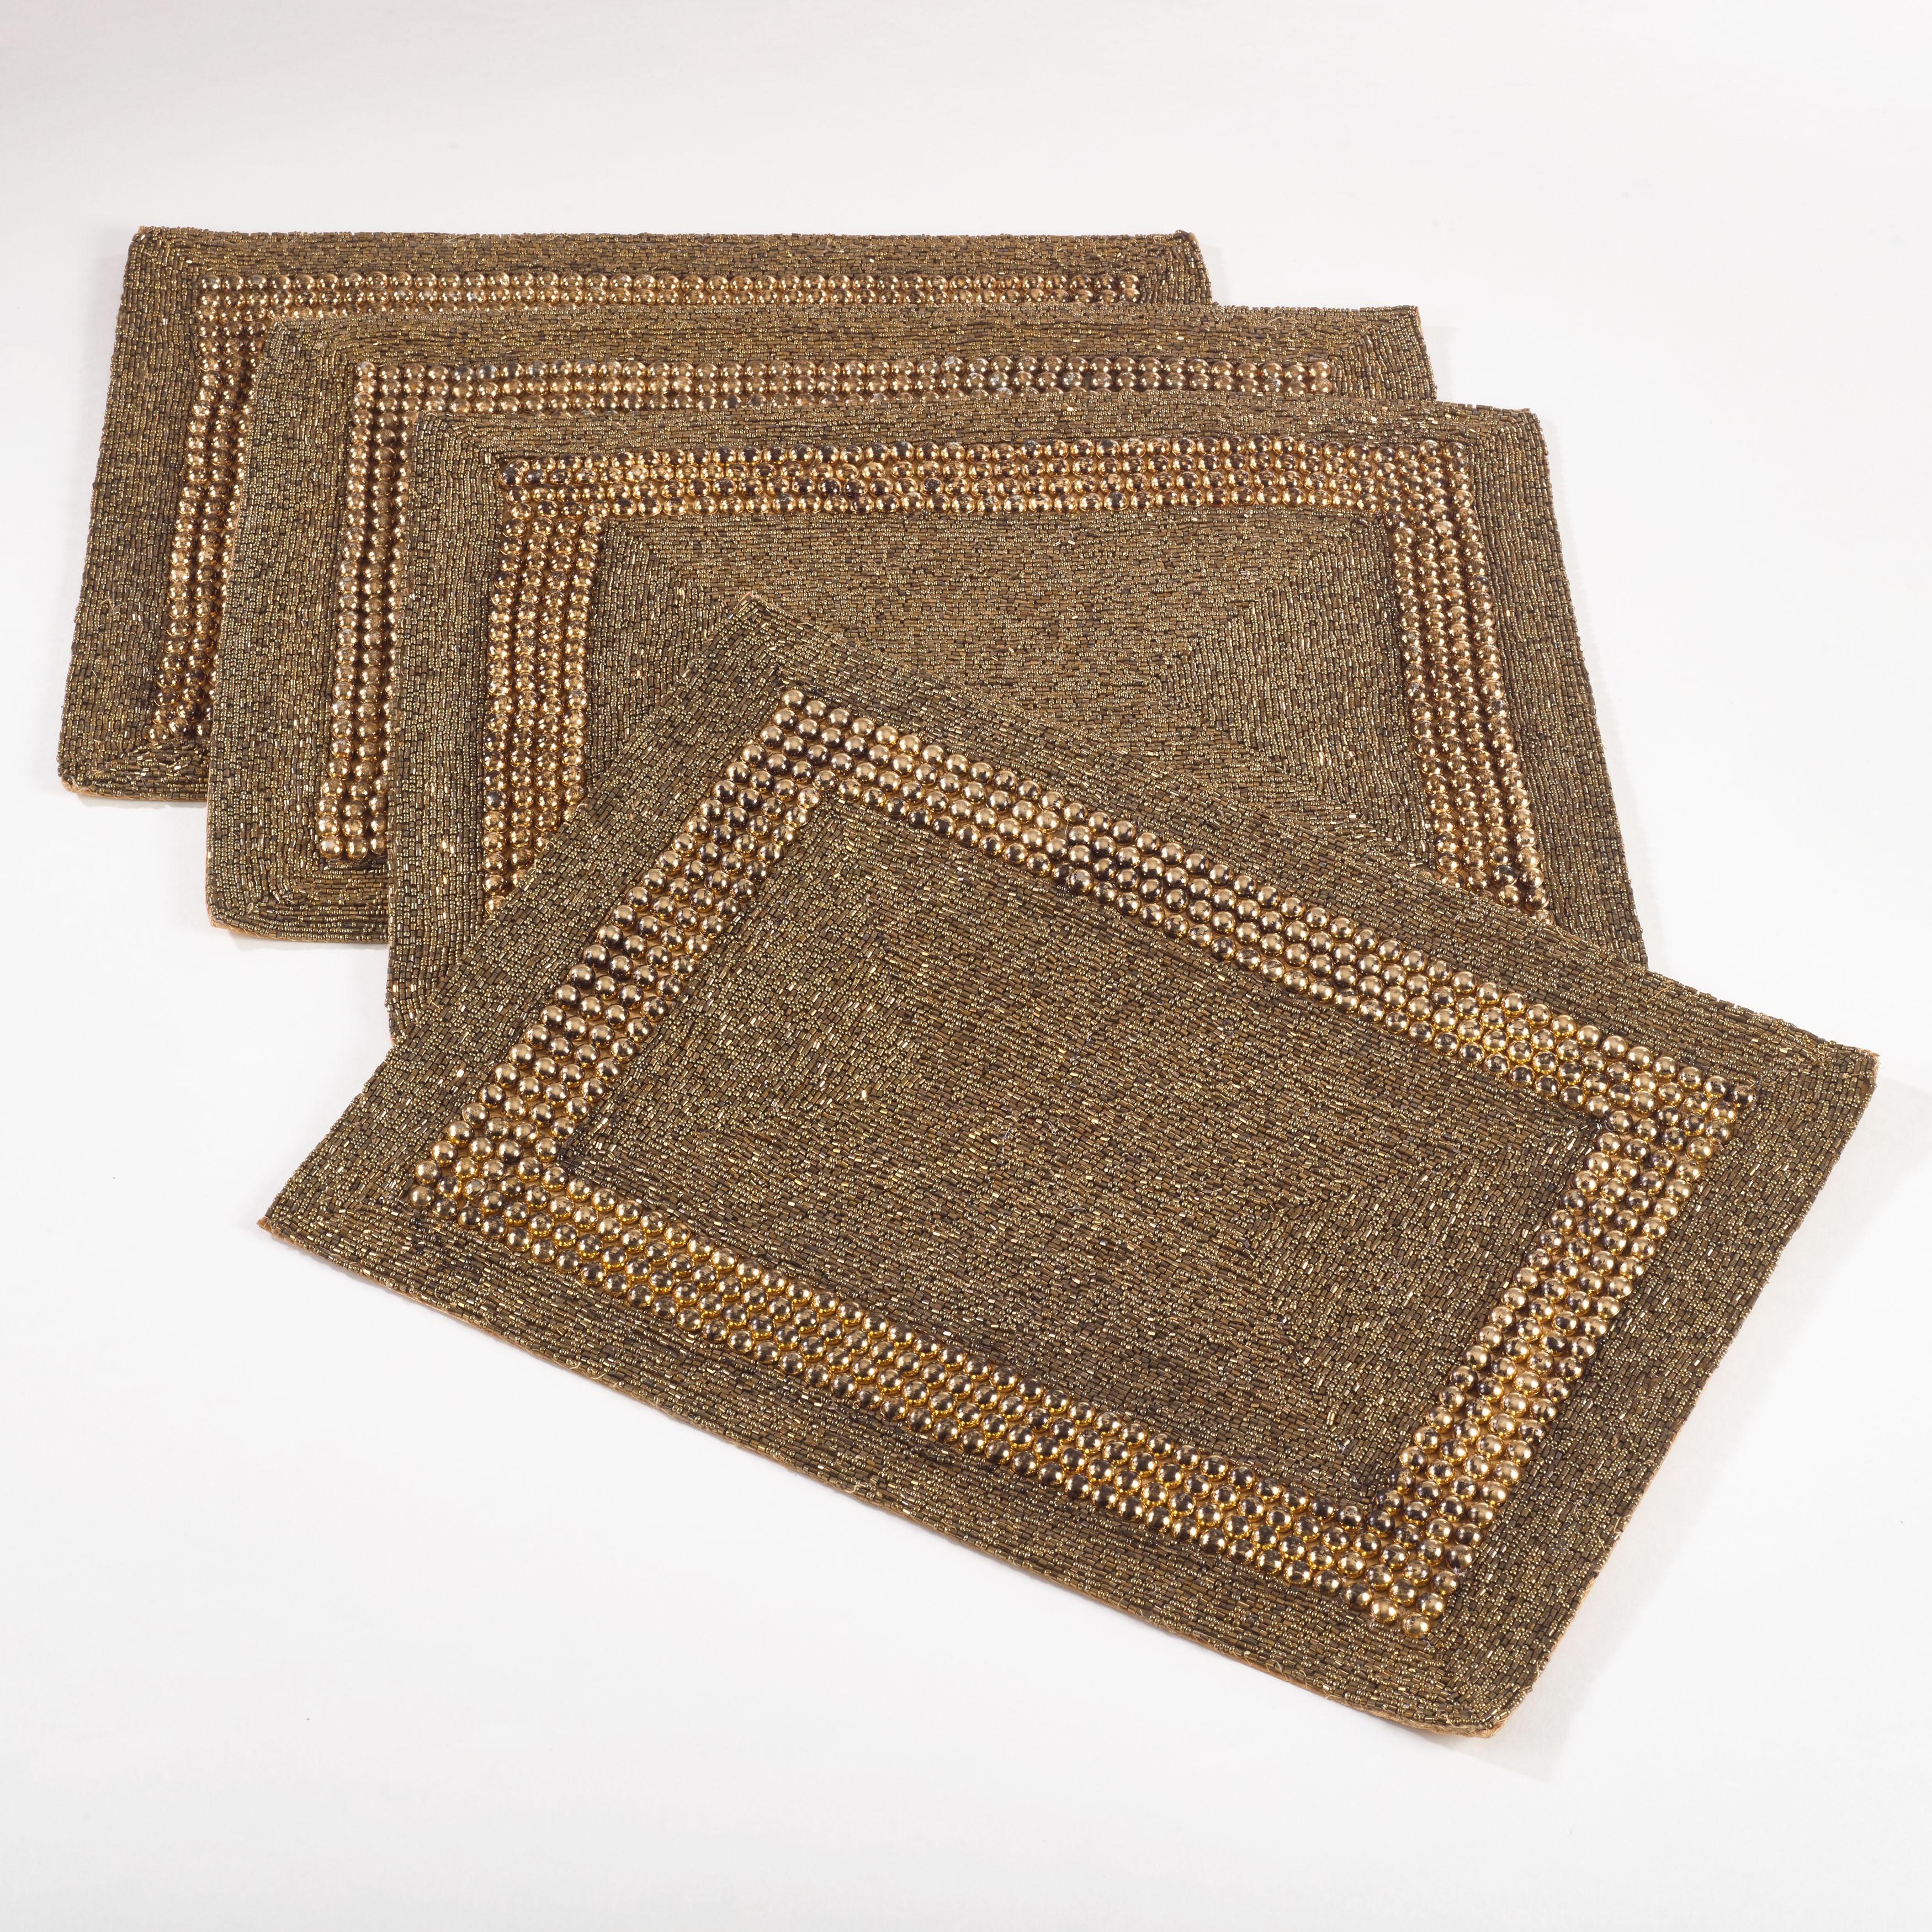 Saro Beaded Design Placemat (Set of 4) (Bronze), Gold (Le...